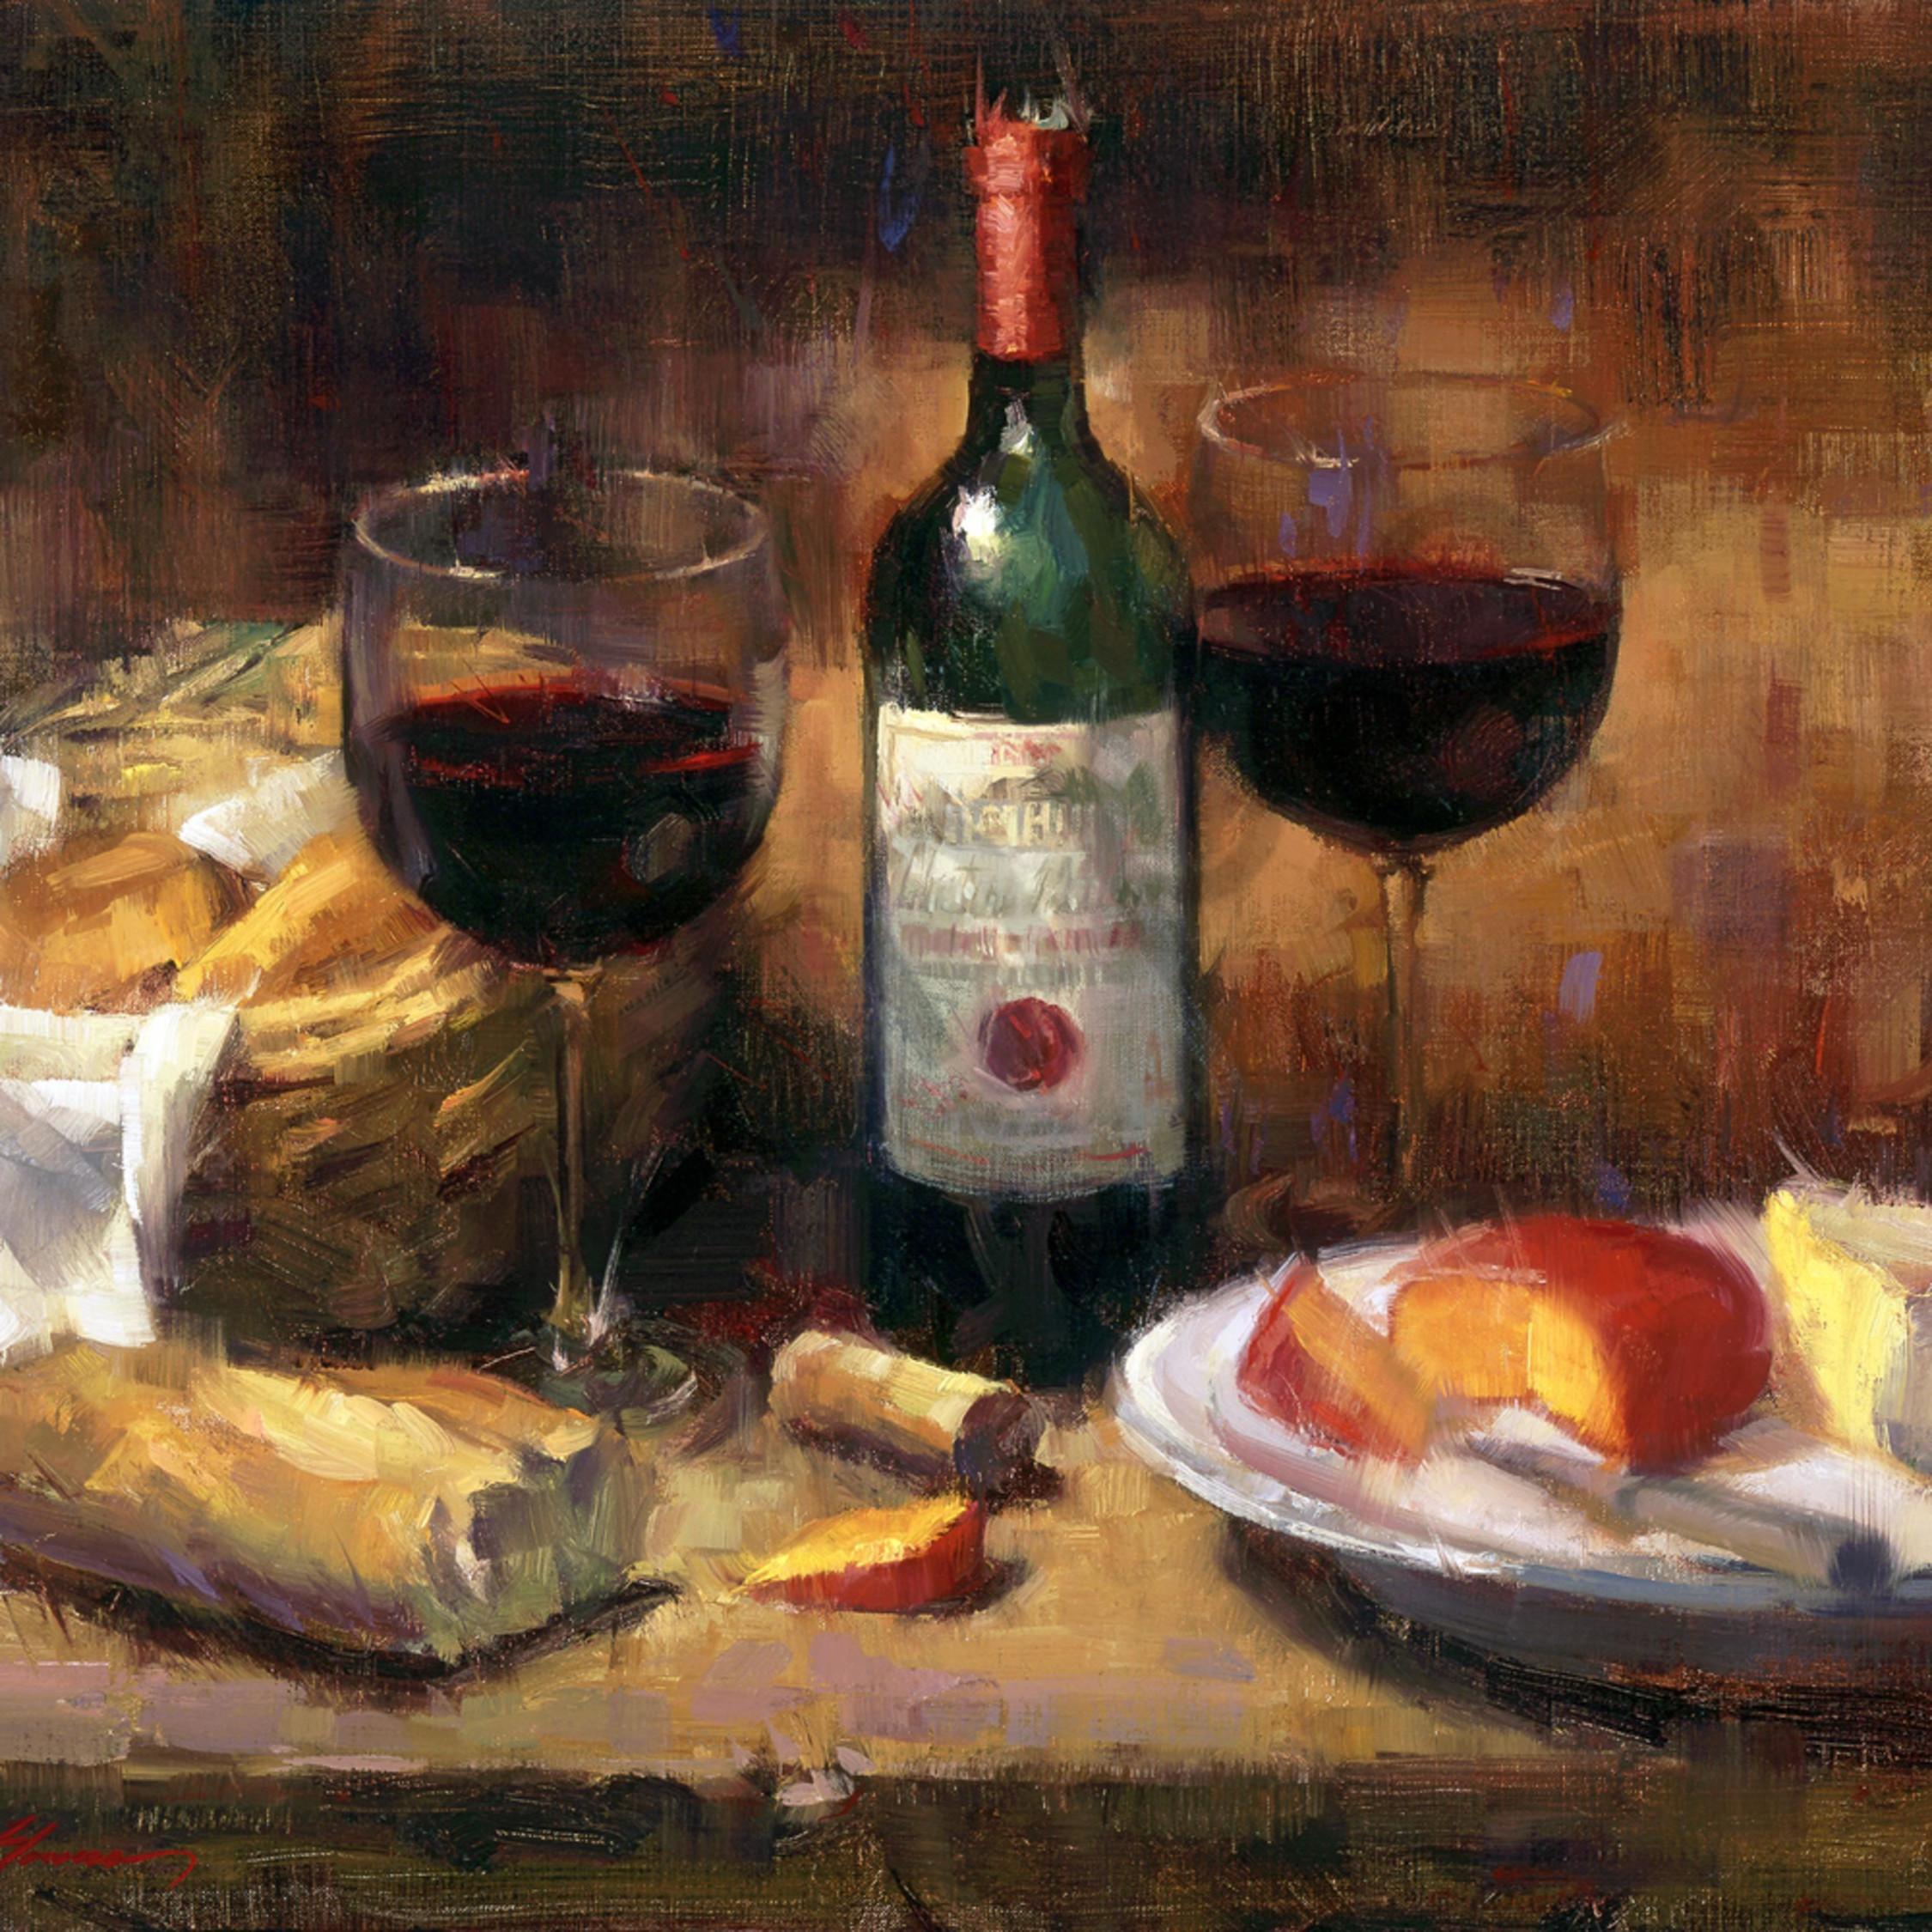 Wine Cheese Still Life Painting Tucson Art Gallery